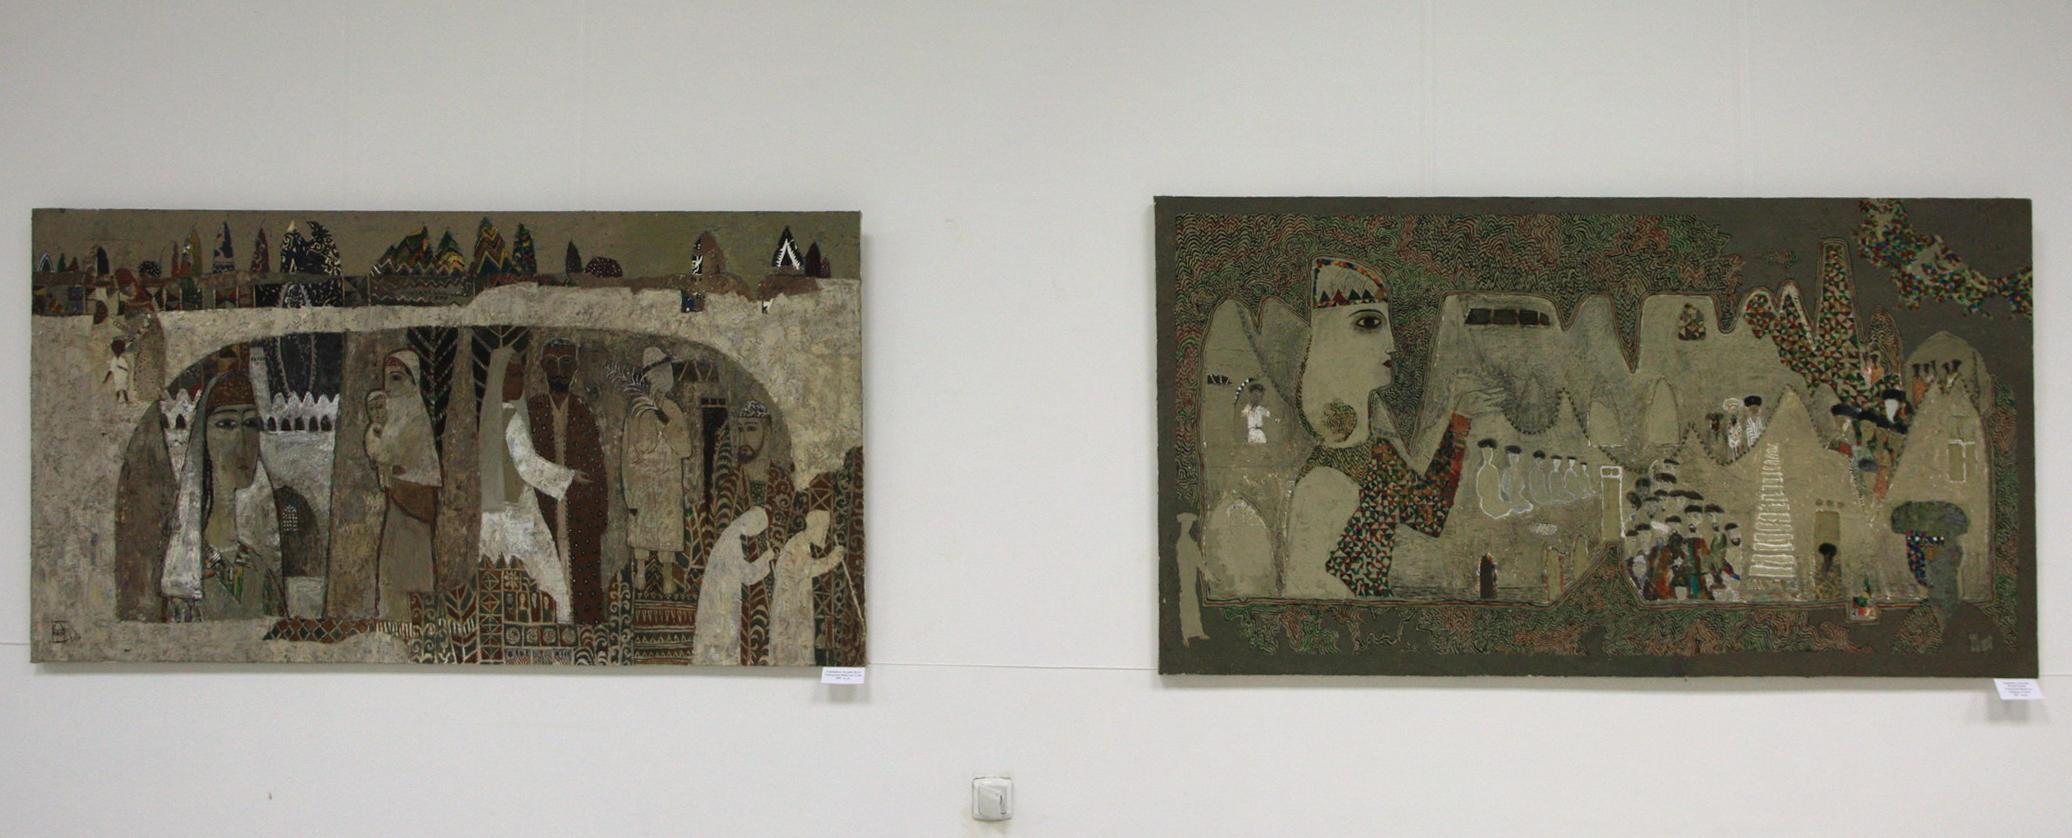 Файзулла Ахмадалиев. Экспозиция картин. Стена. 2009, Однажды в Хиве. 2017